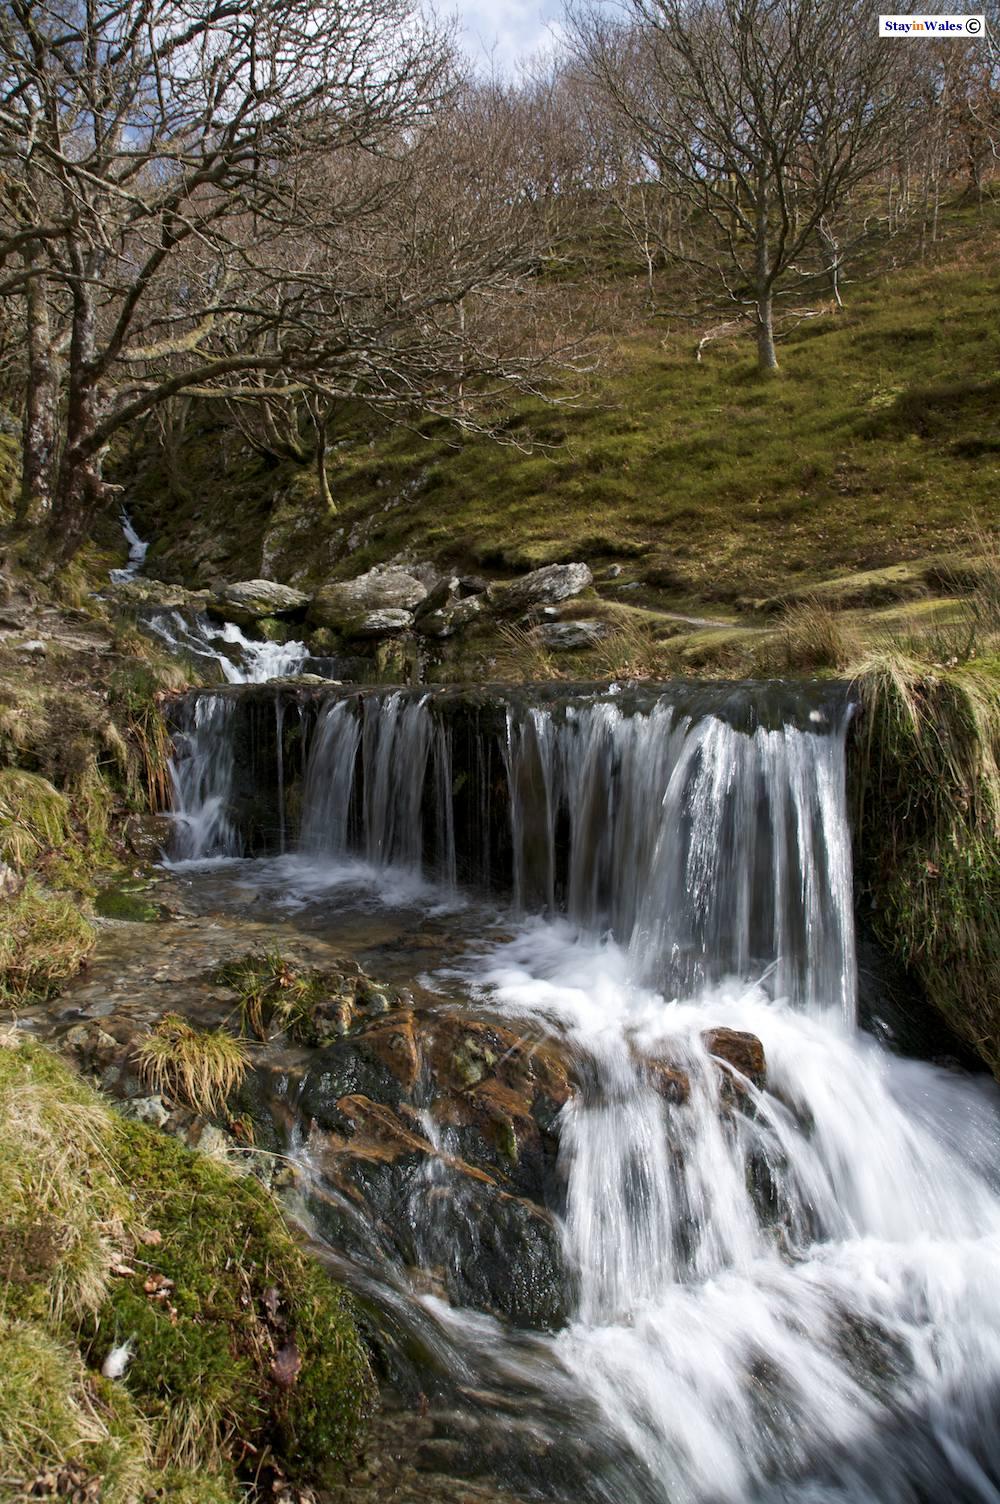 Mountain stream in the Elan Valley